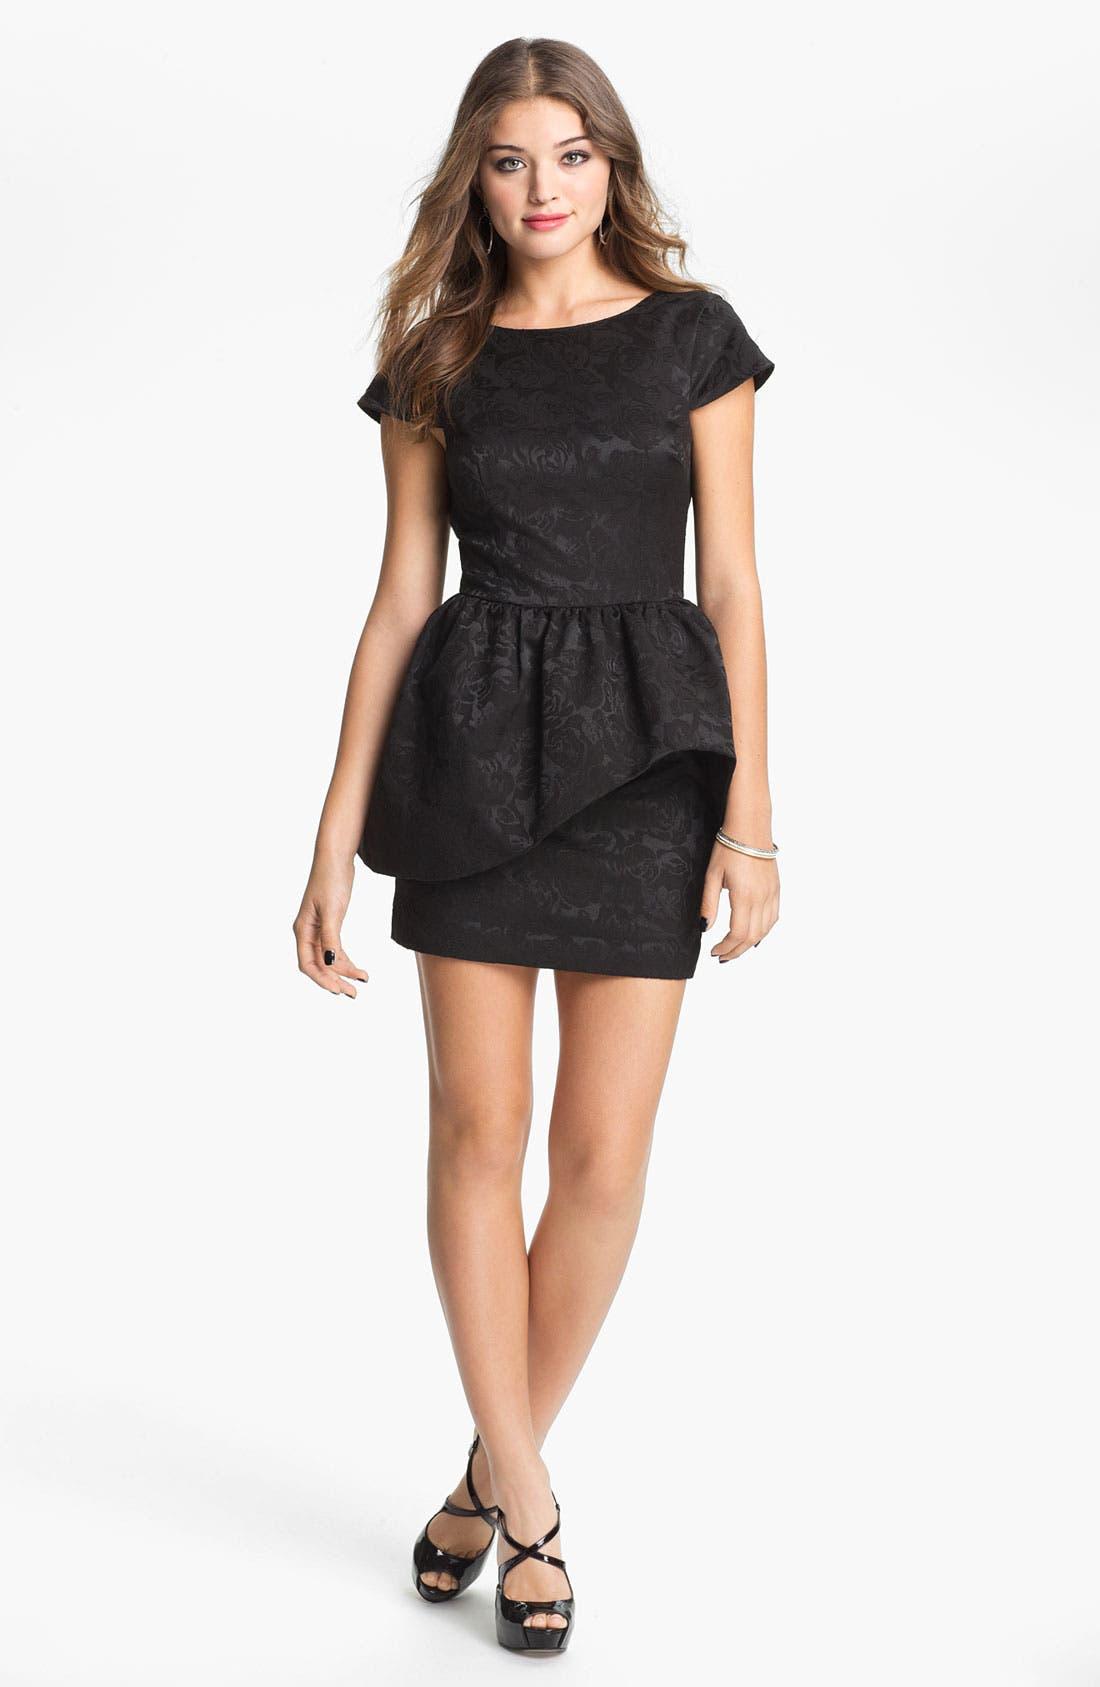 Alternate Image 1 Selected - Keepsake the Label 'Shake It Out' Peplum Dress